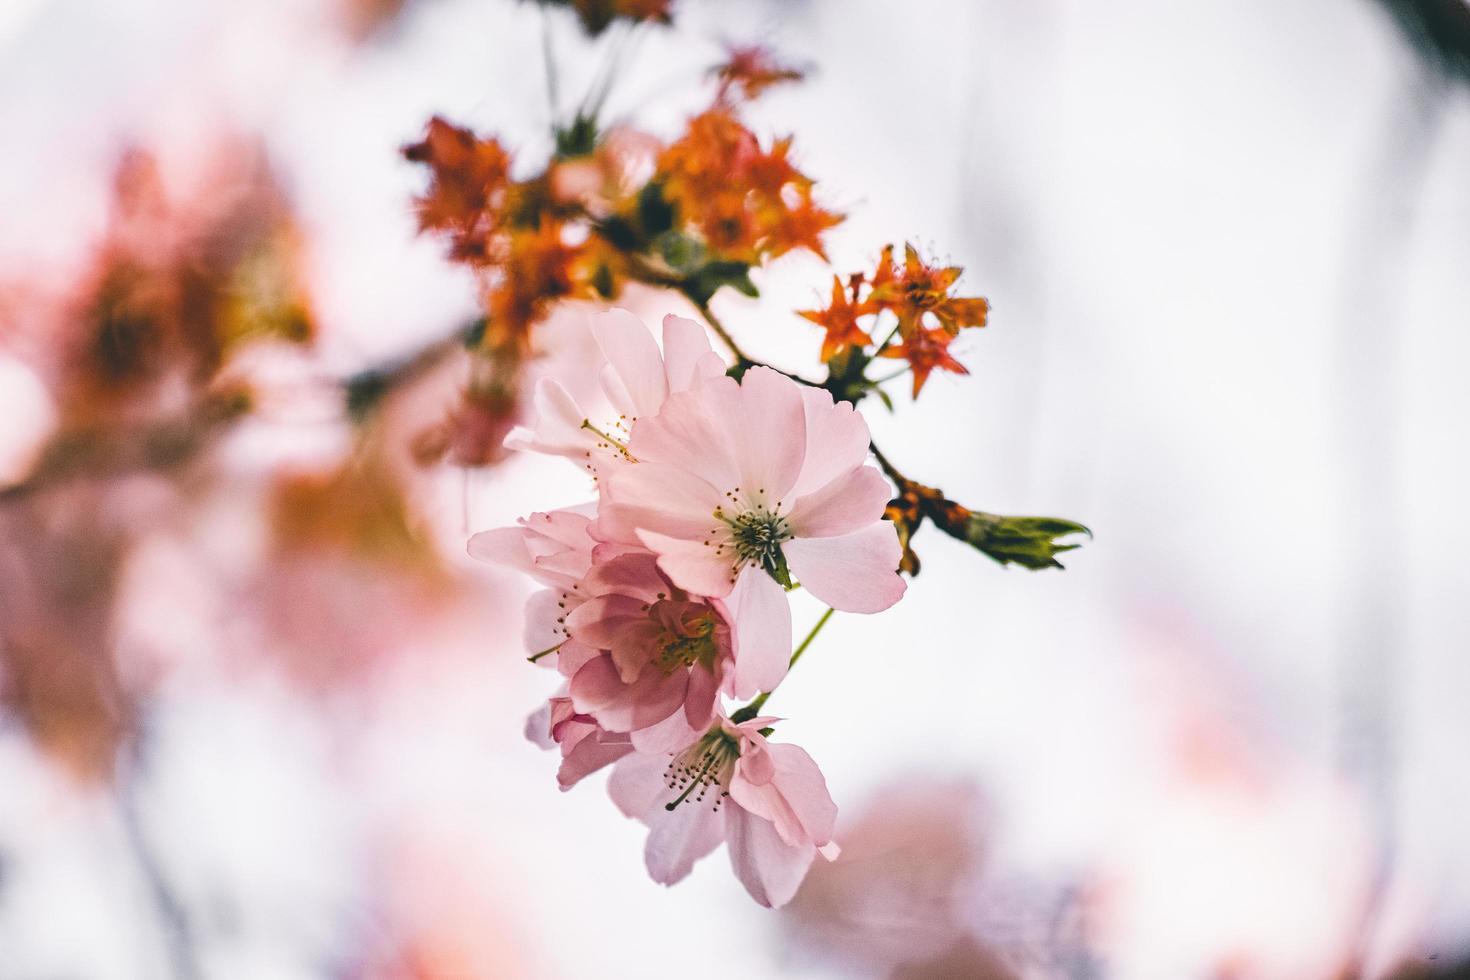 flores cor de rosa e brancas foto